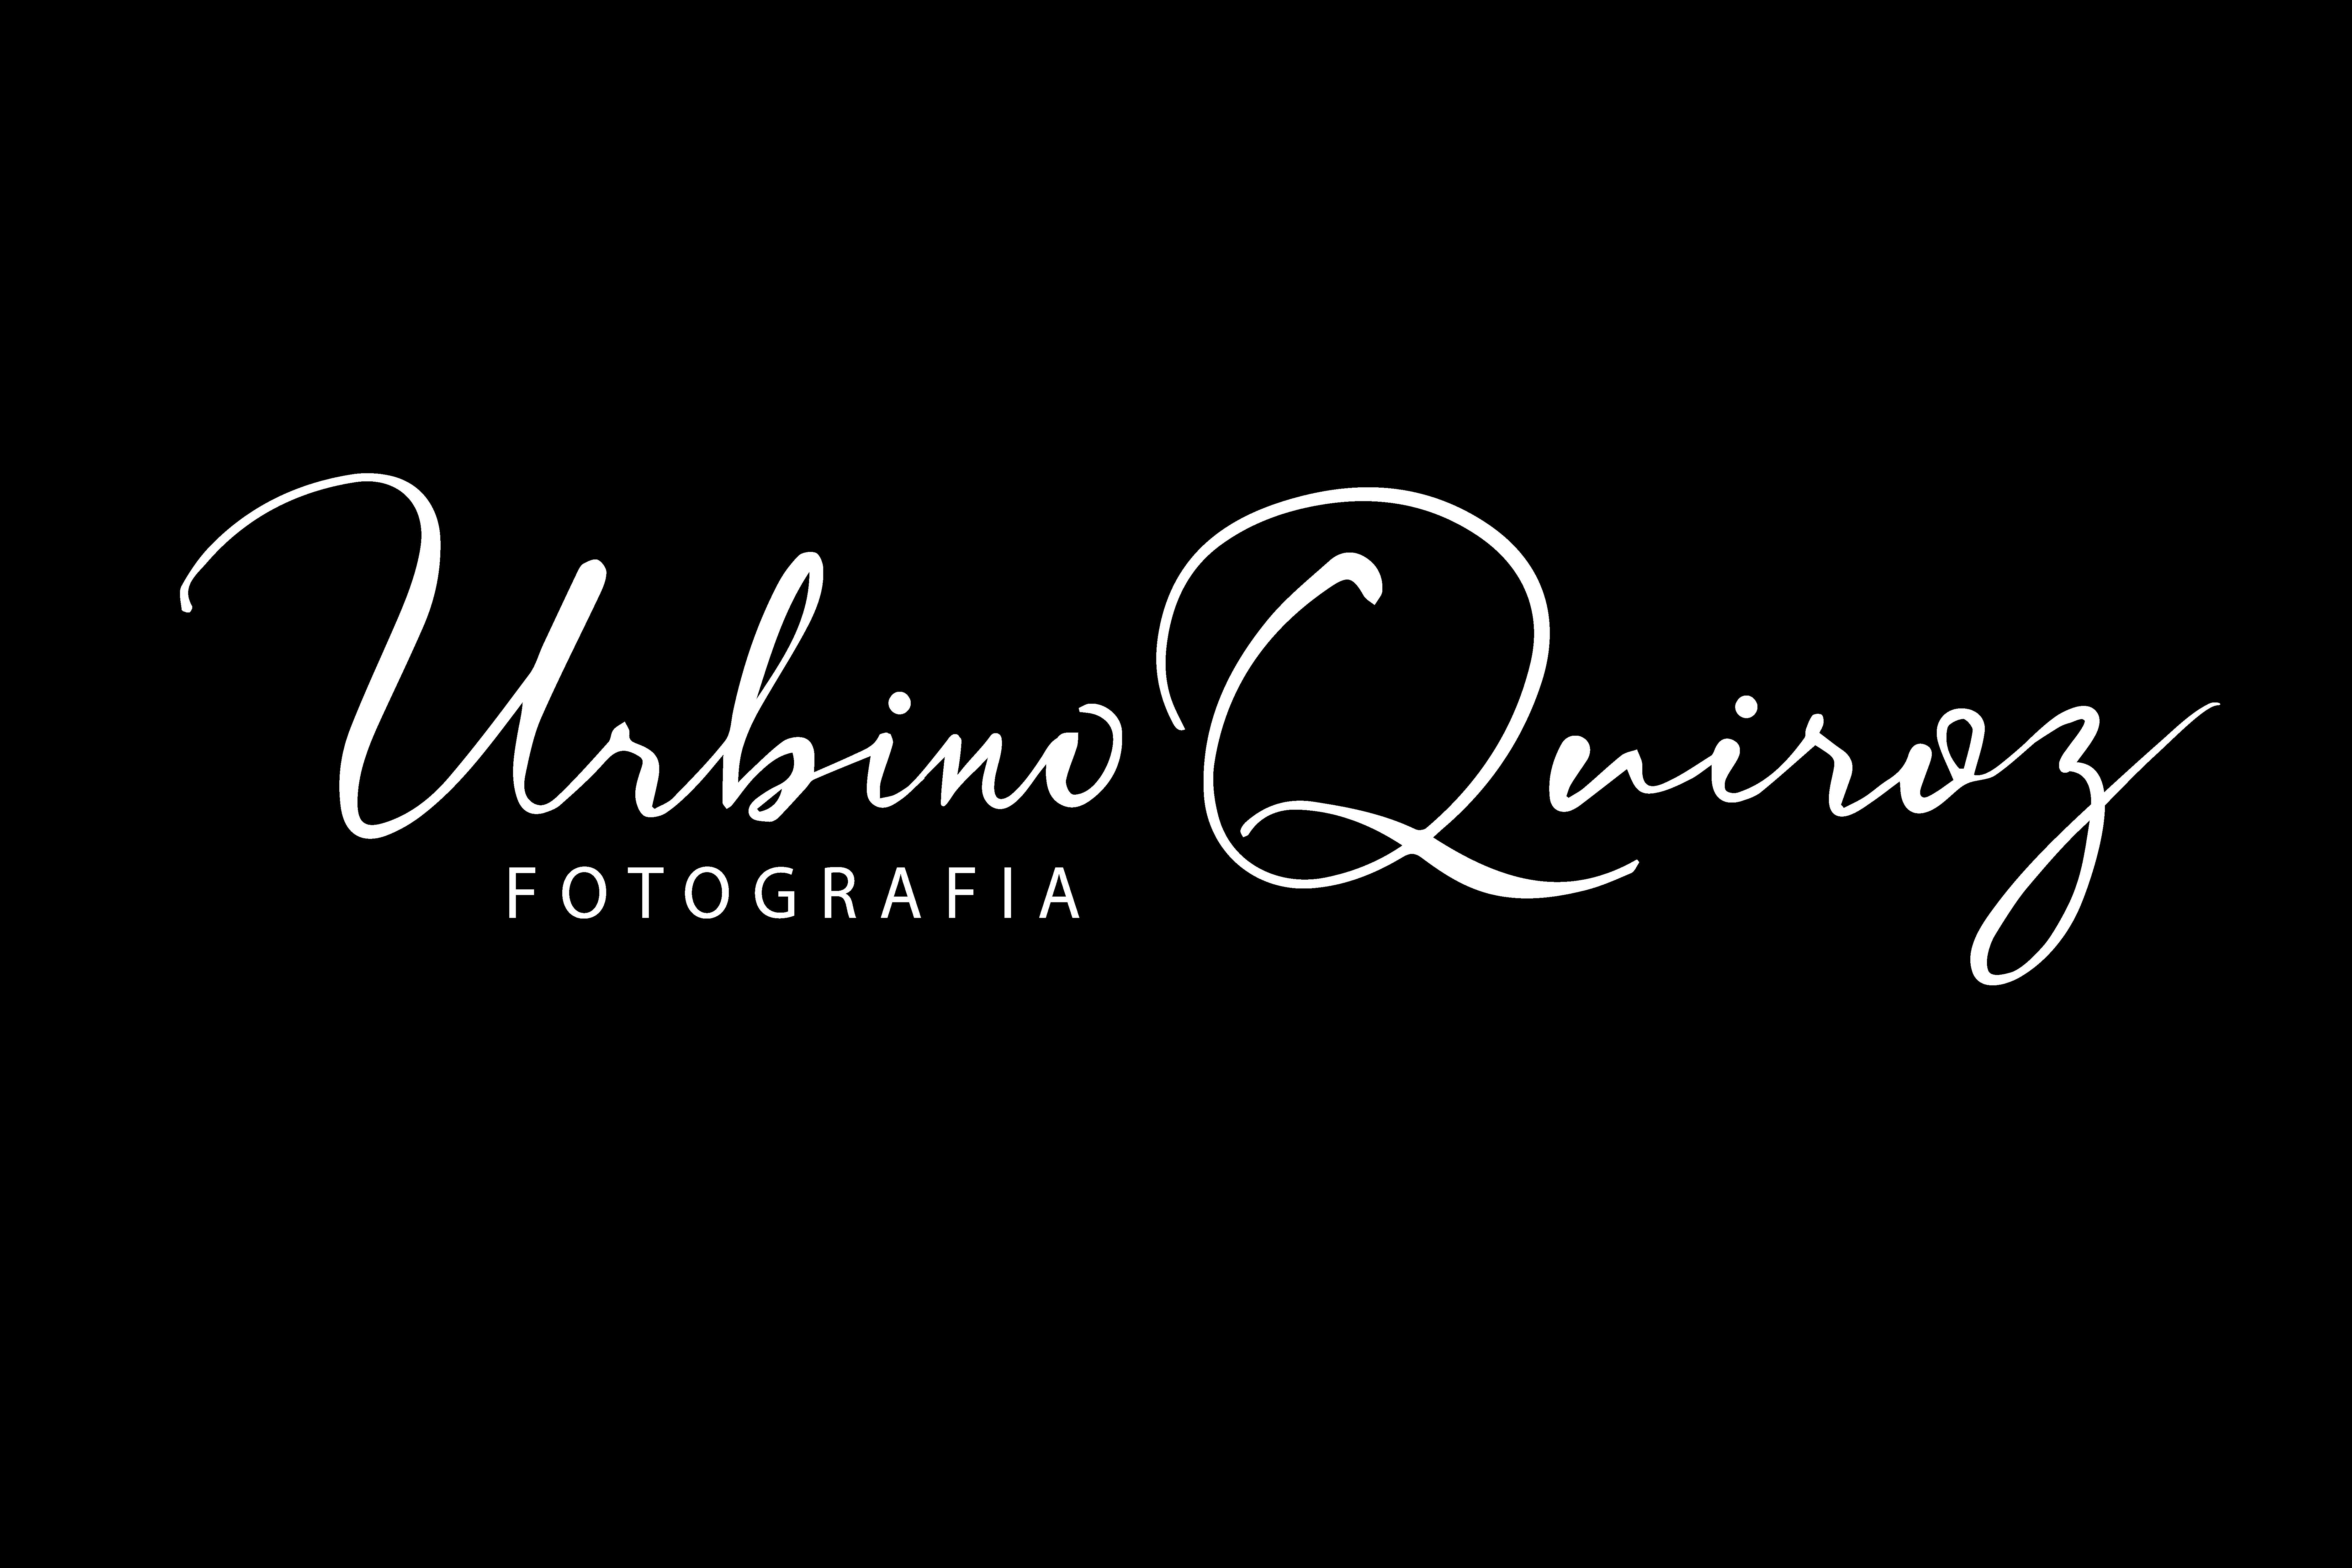 Urbino-Quiroz-rev-white-high-res